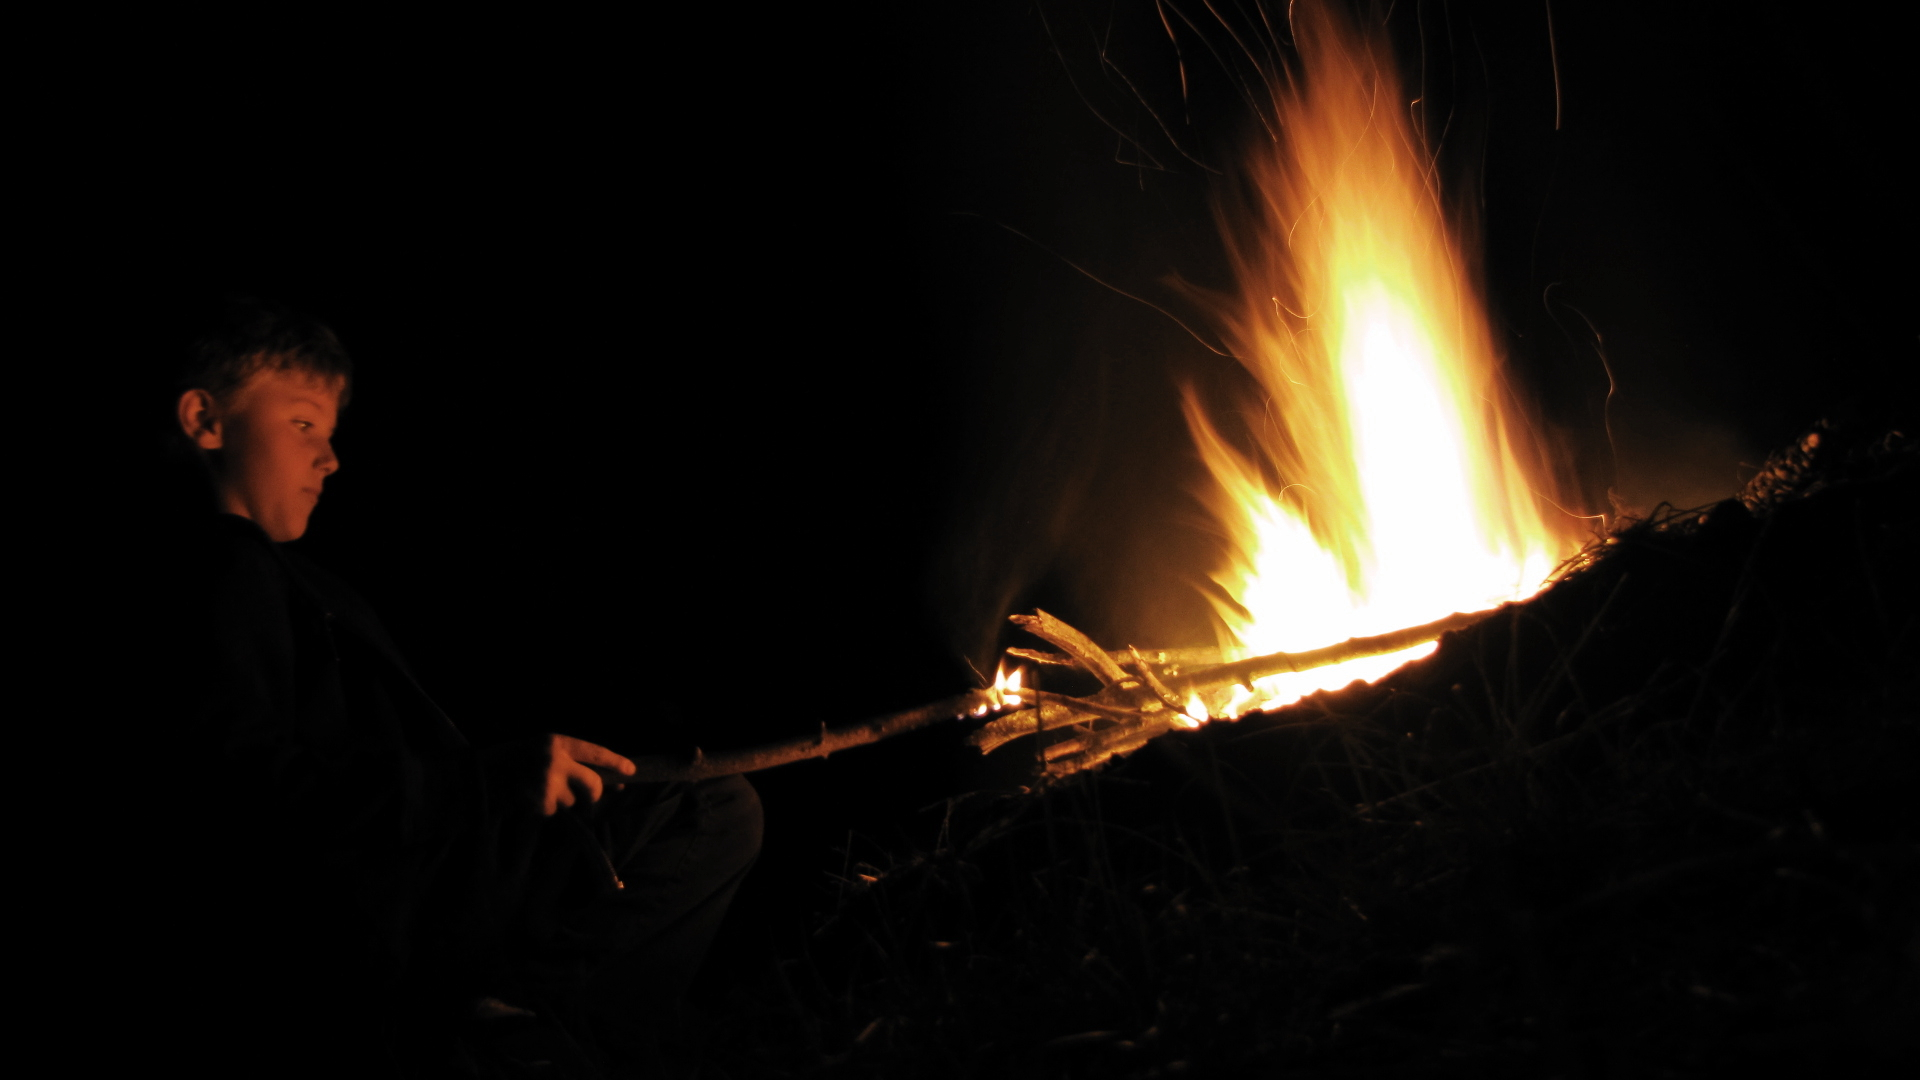 A stick in the campfire